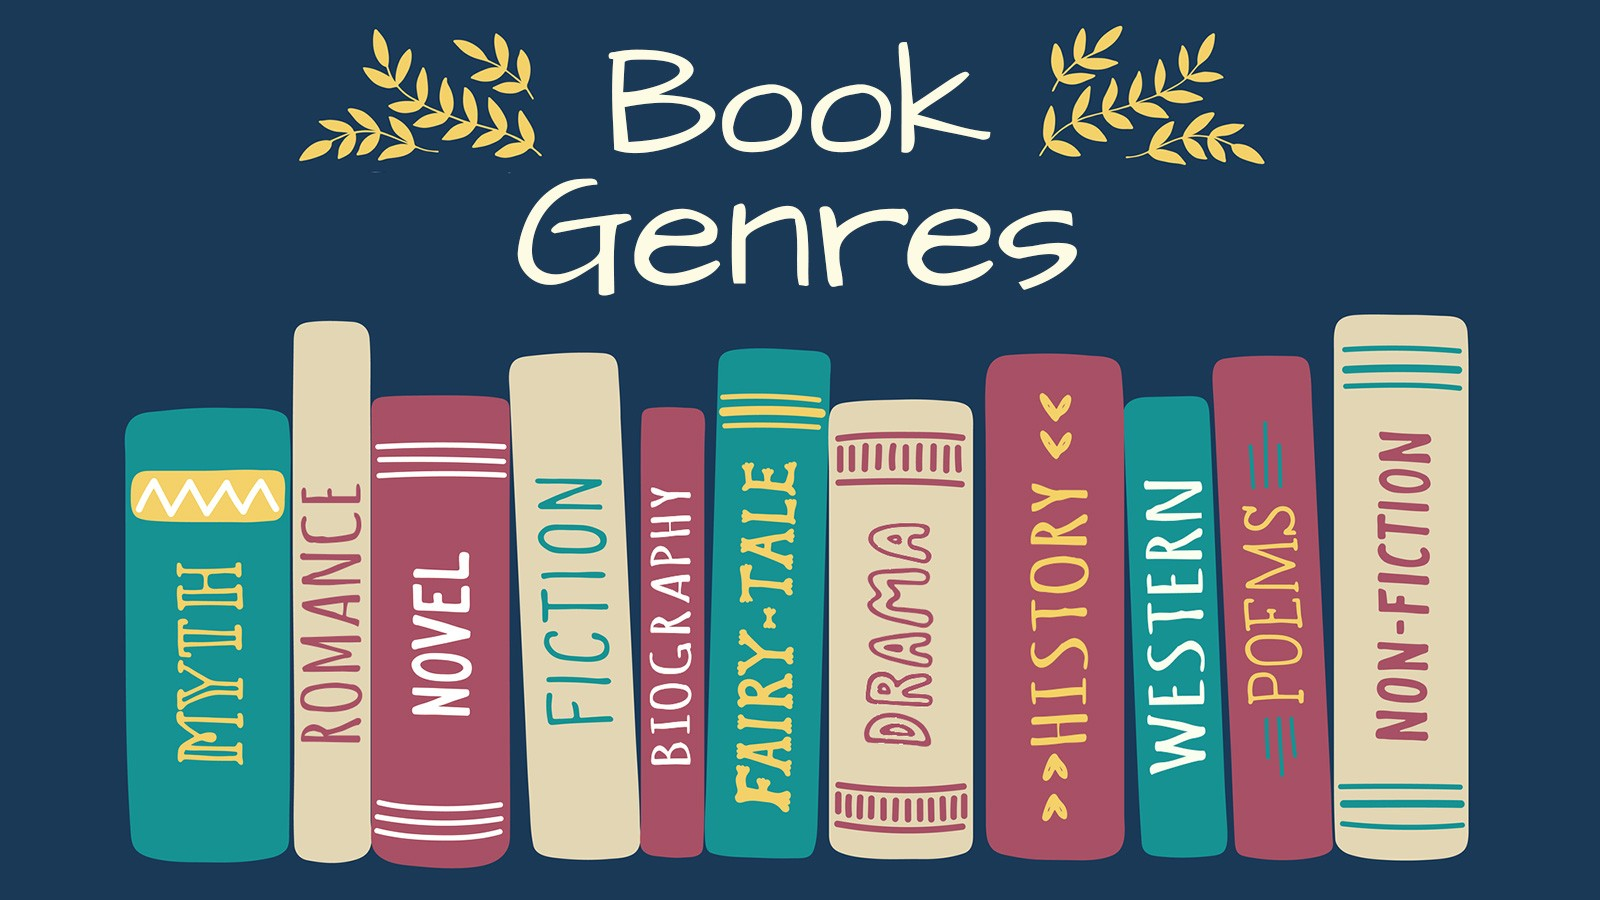 Type: Book